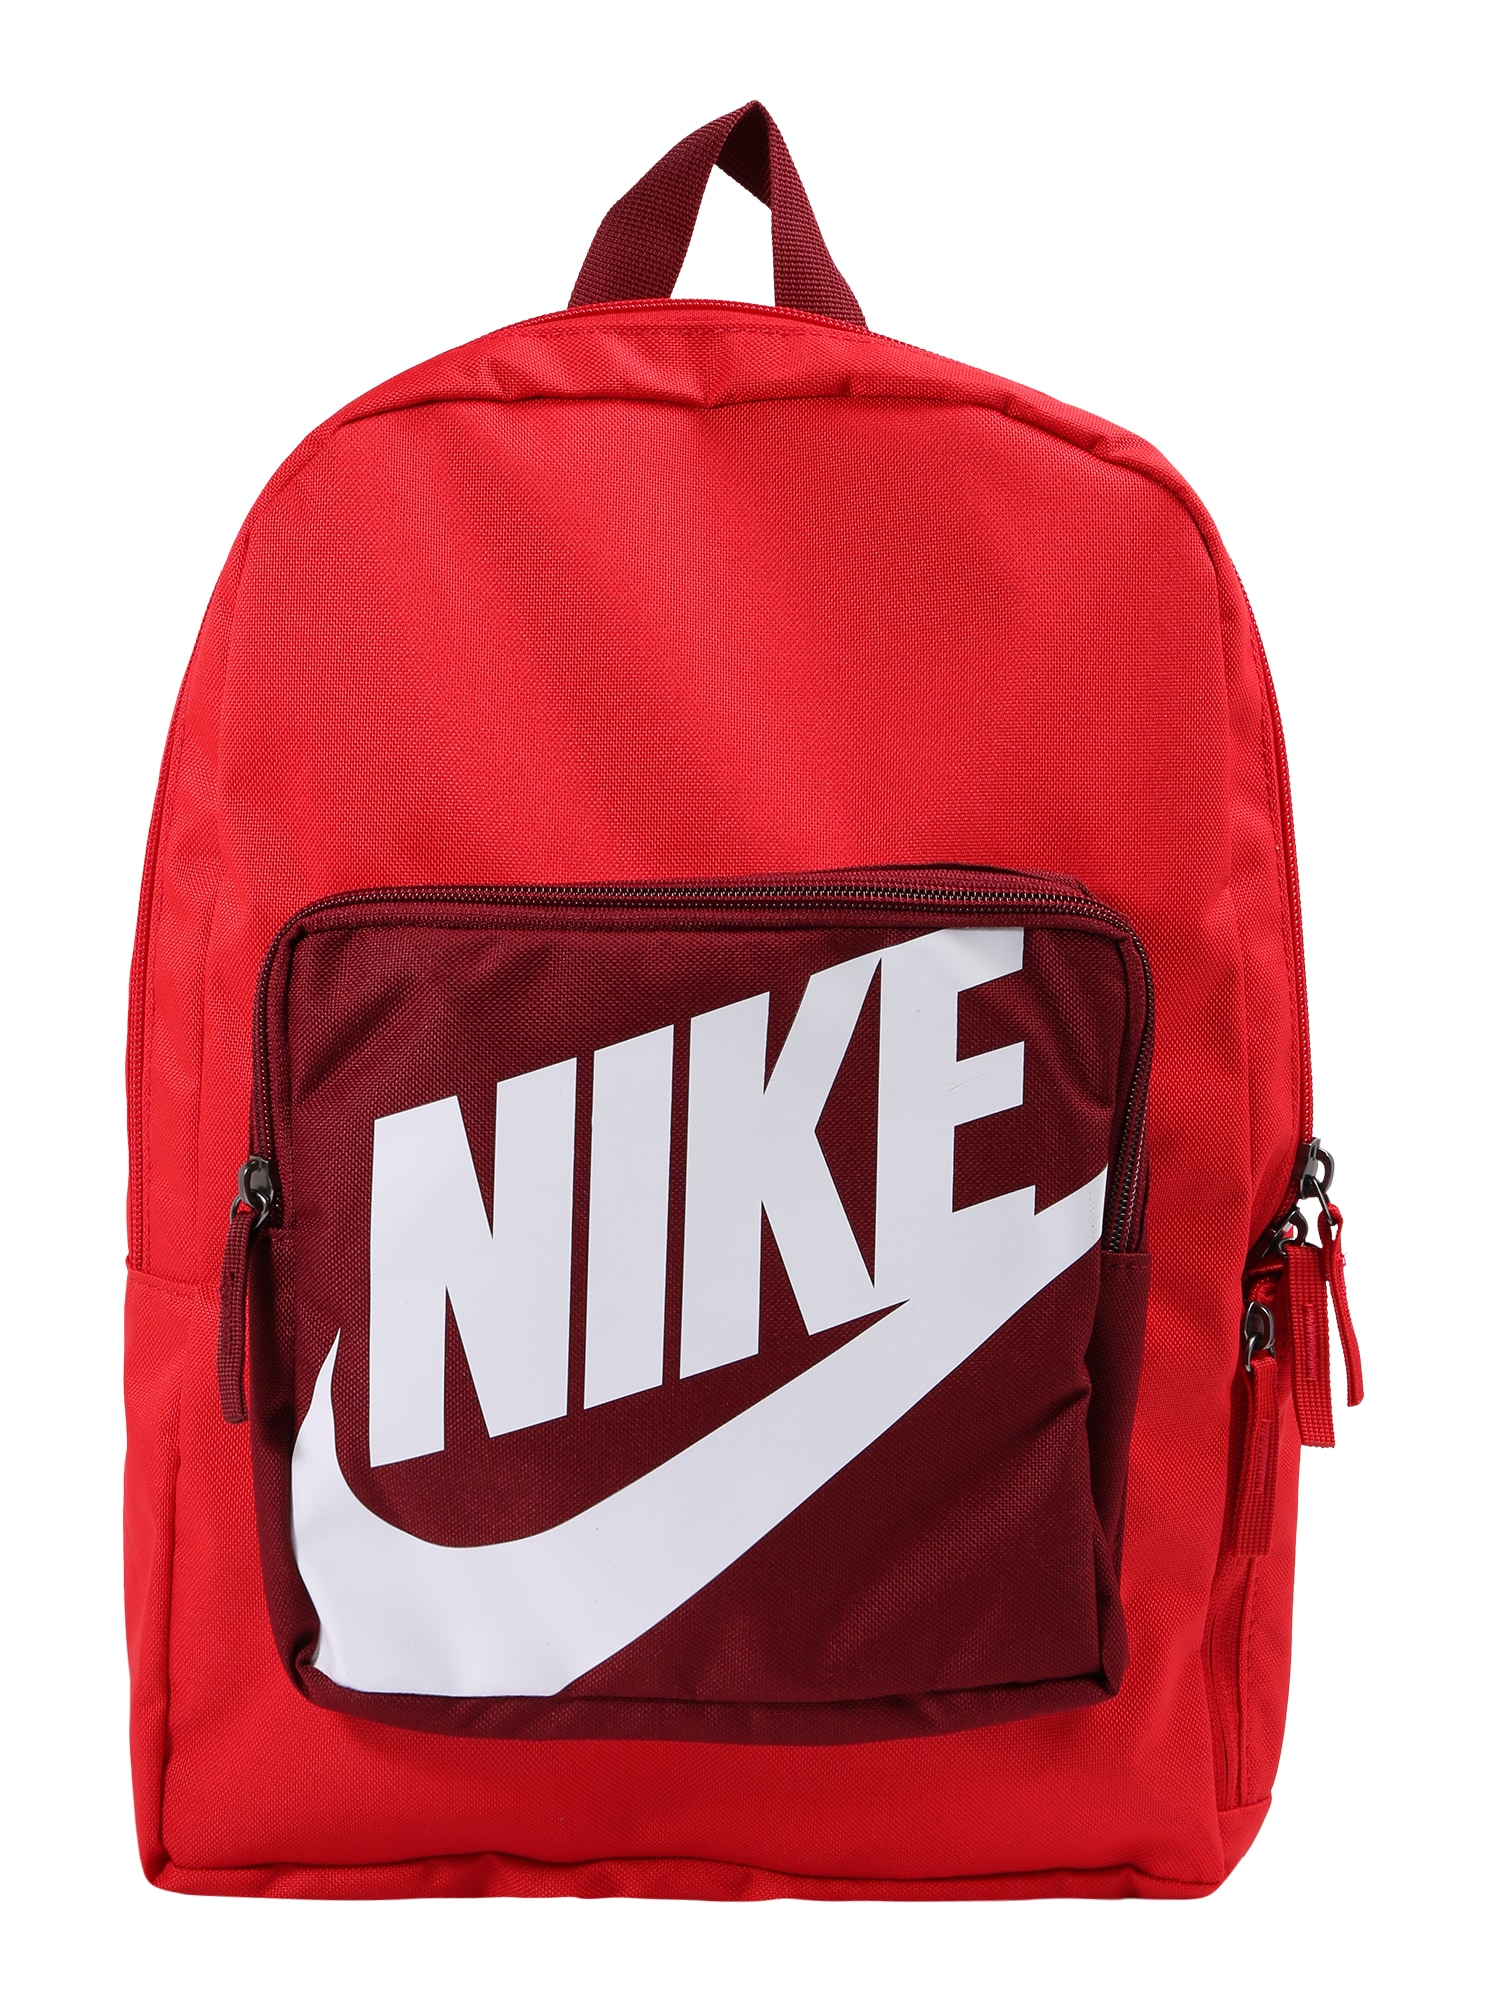 Batoh červená merlot bílá Nike Sportswear